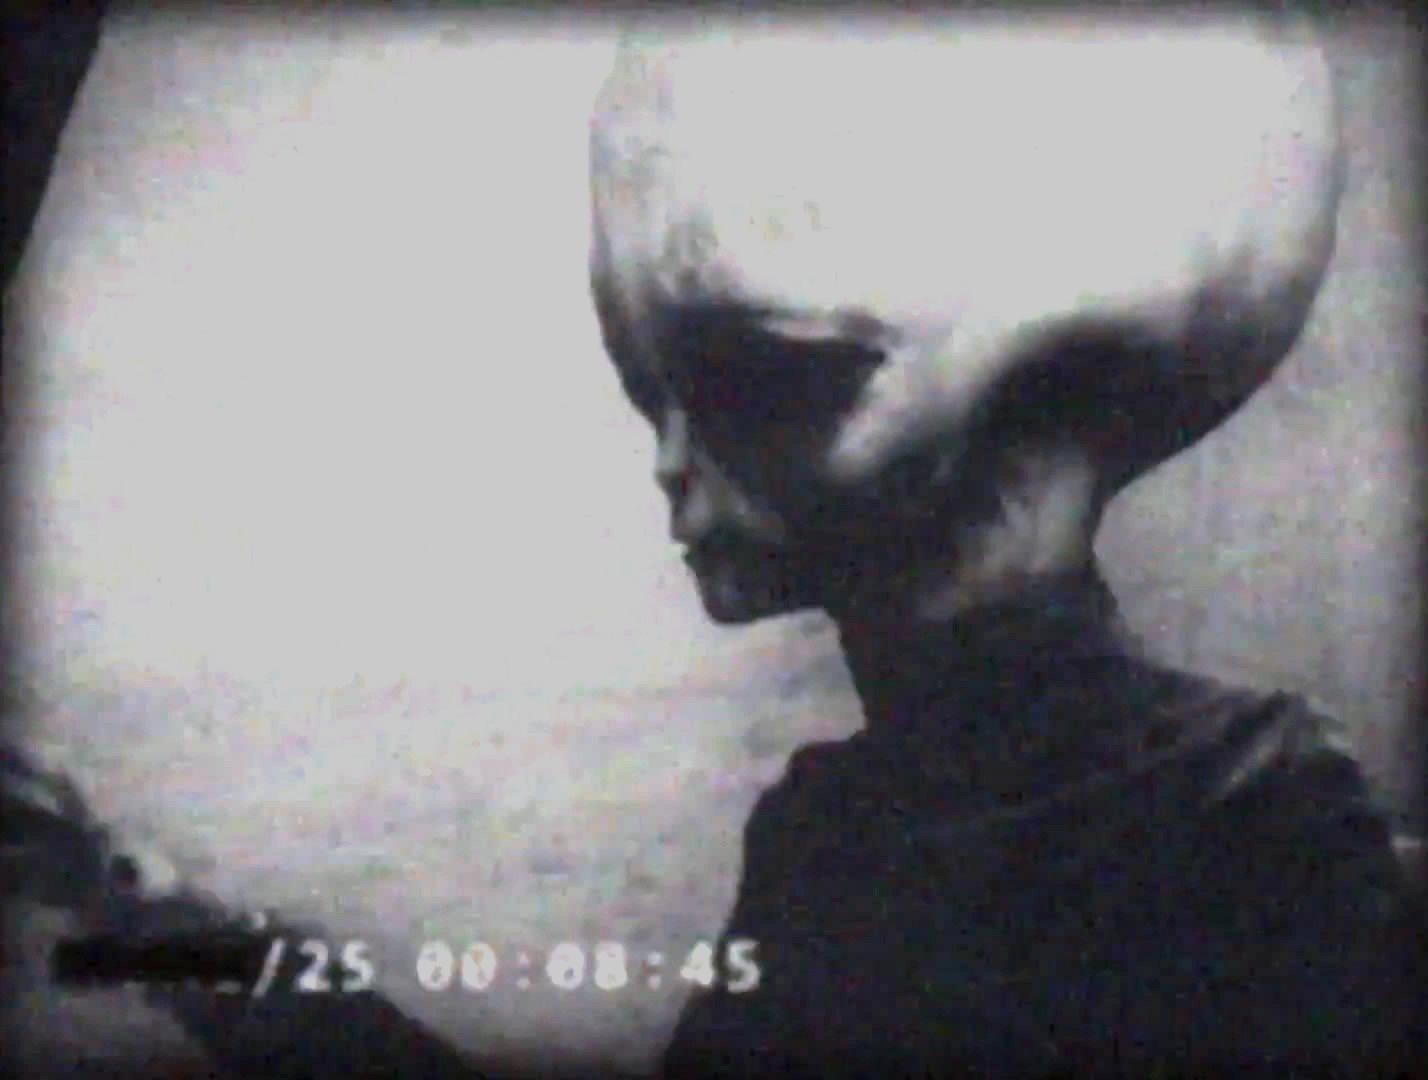 GlobaLove Think Tank: alien grey extraterrestrial zeta